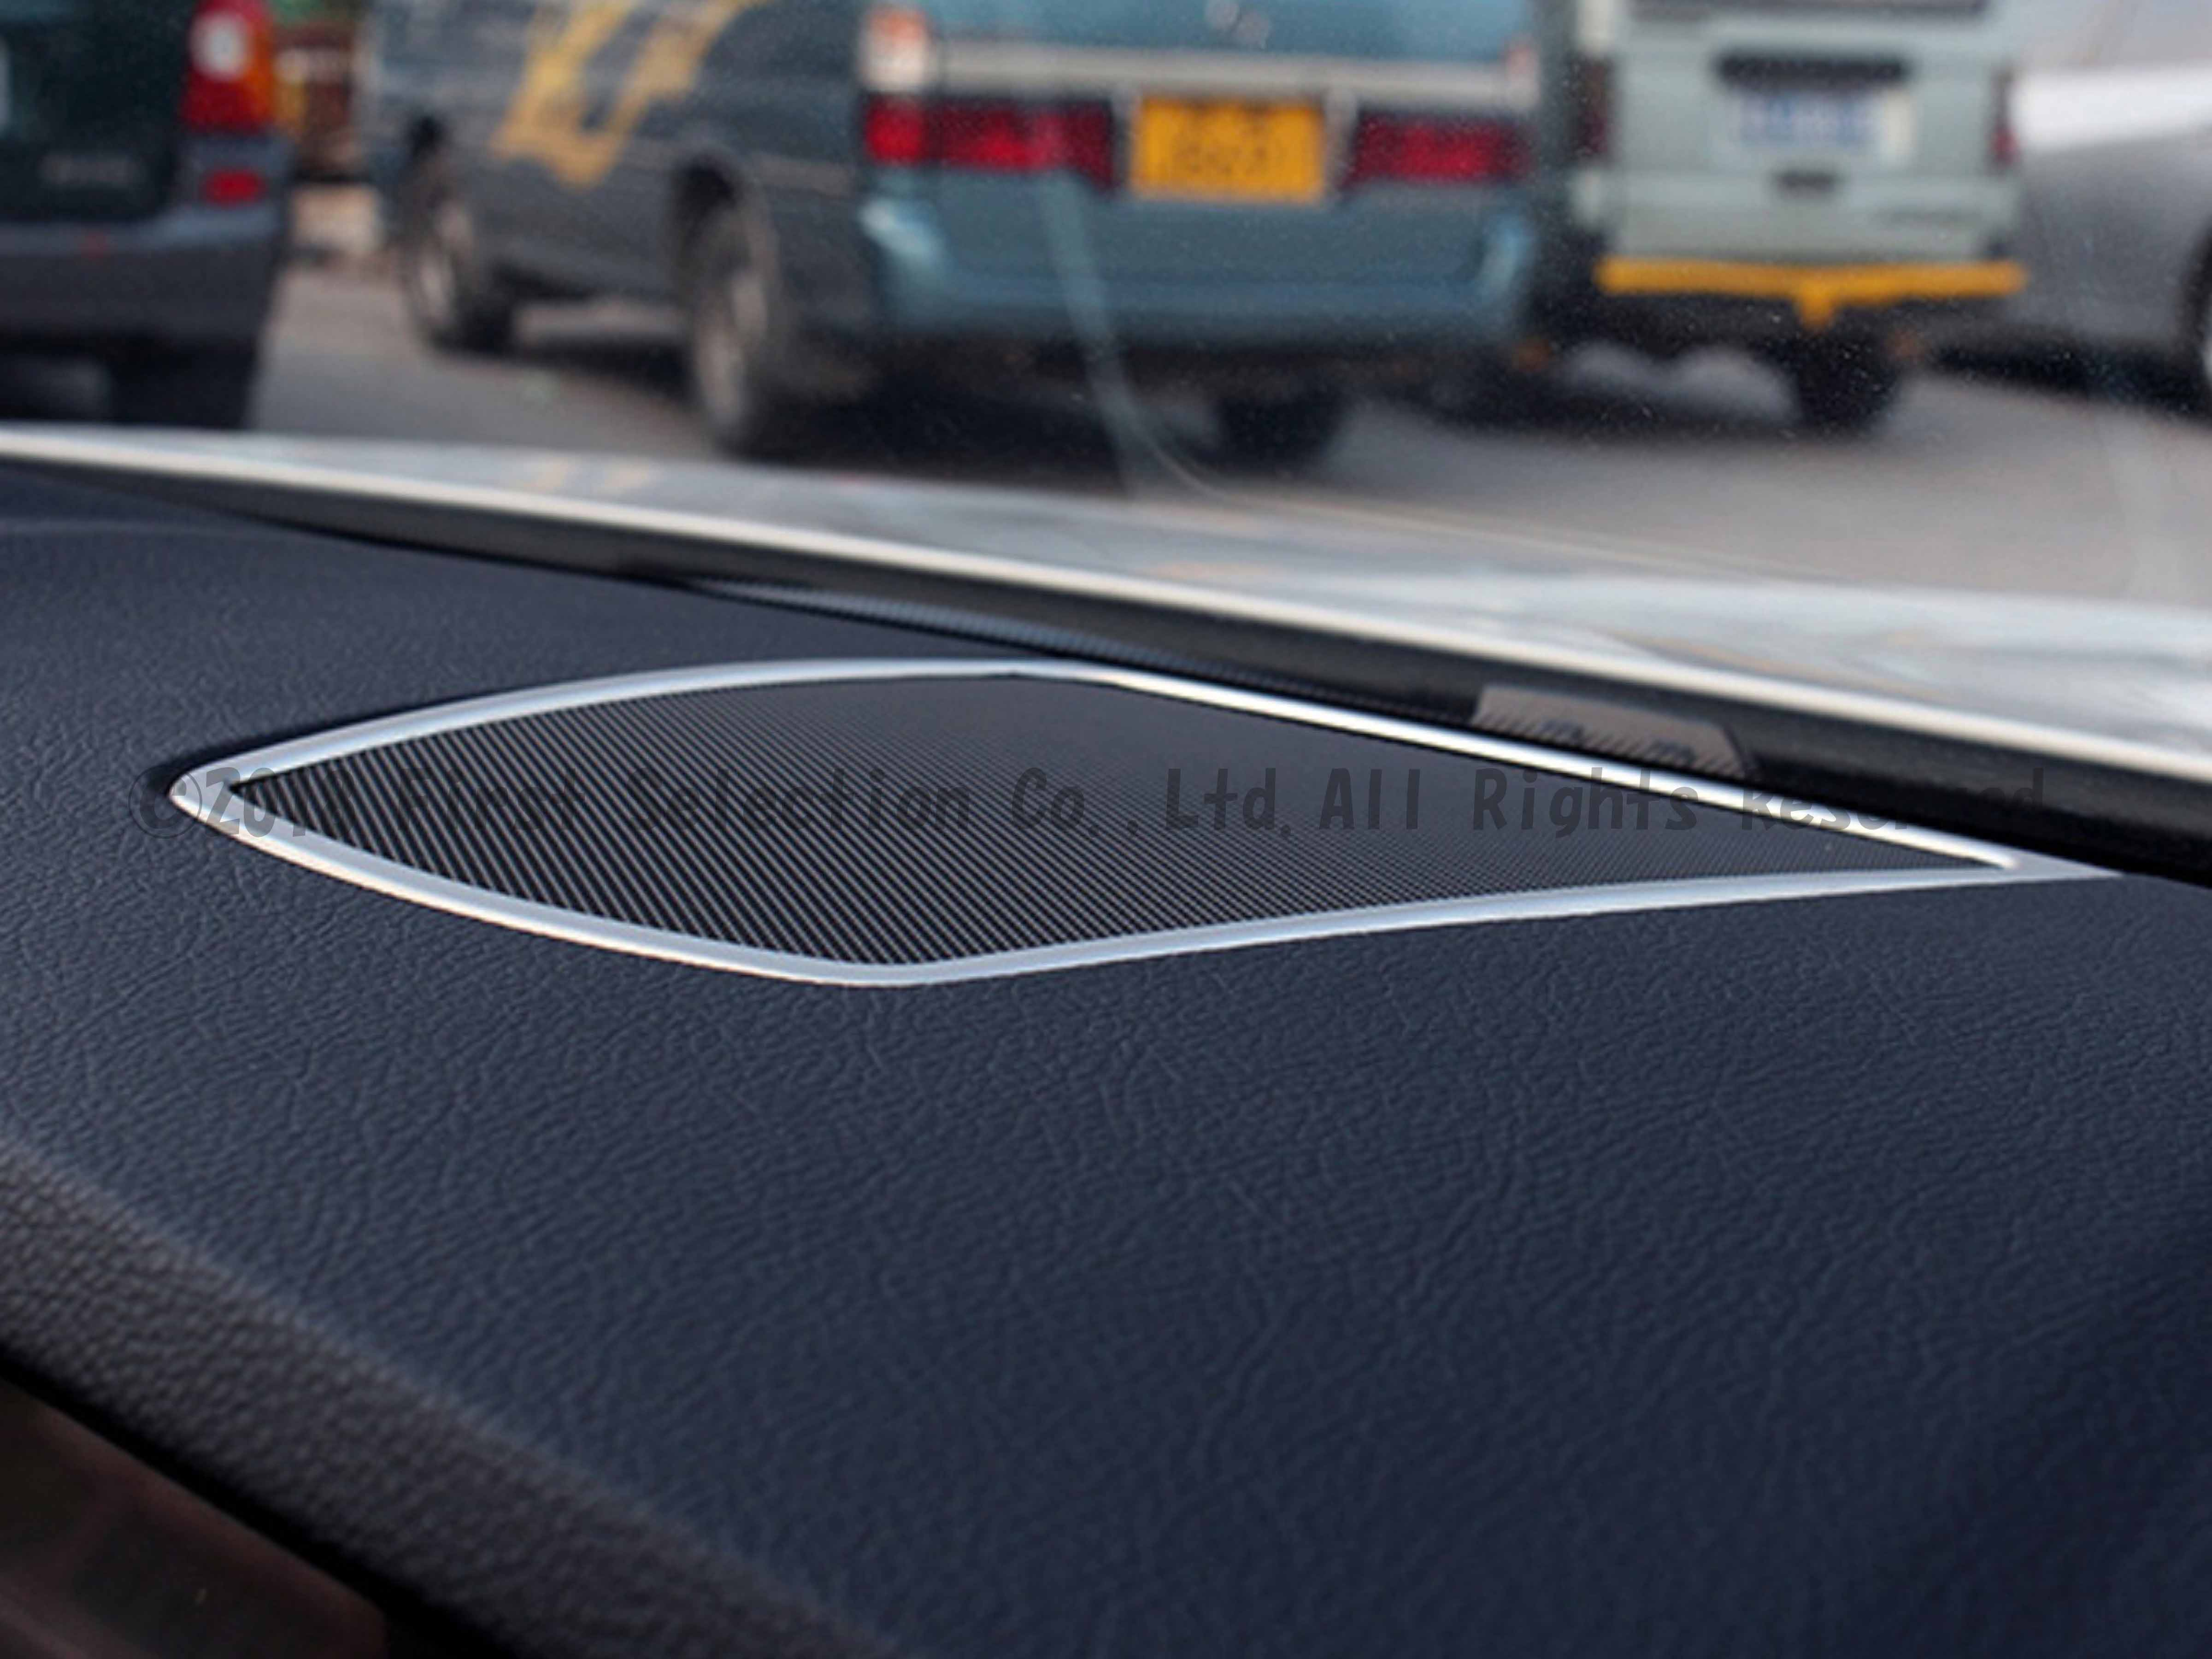 BMW車 F系5シリーズ用 センタースピーカーデコレーショントリム